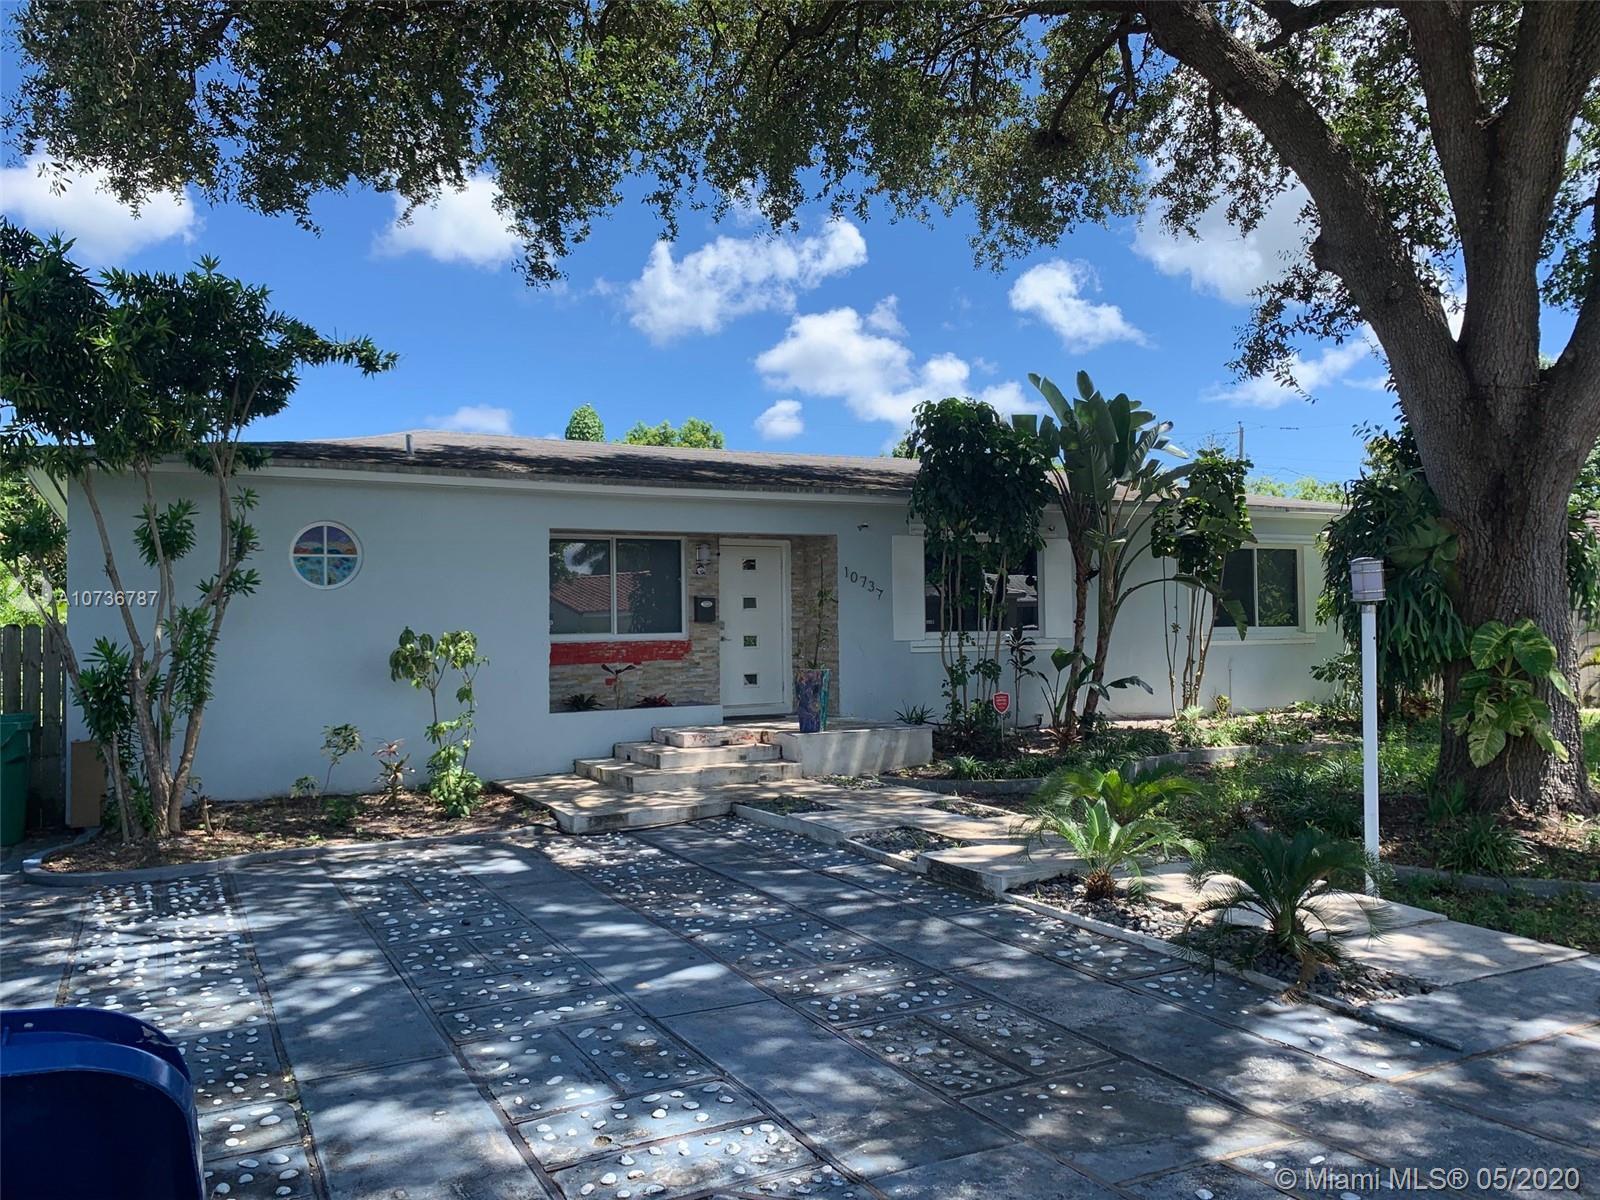 10737 NE 2nd Pl, Miami Shores, Florida